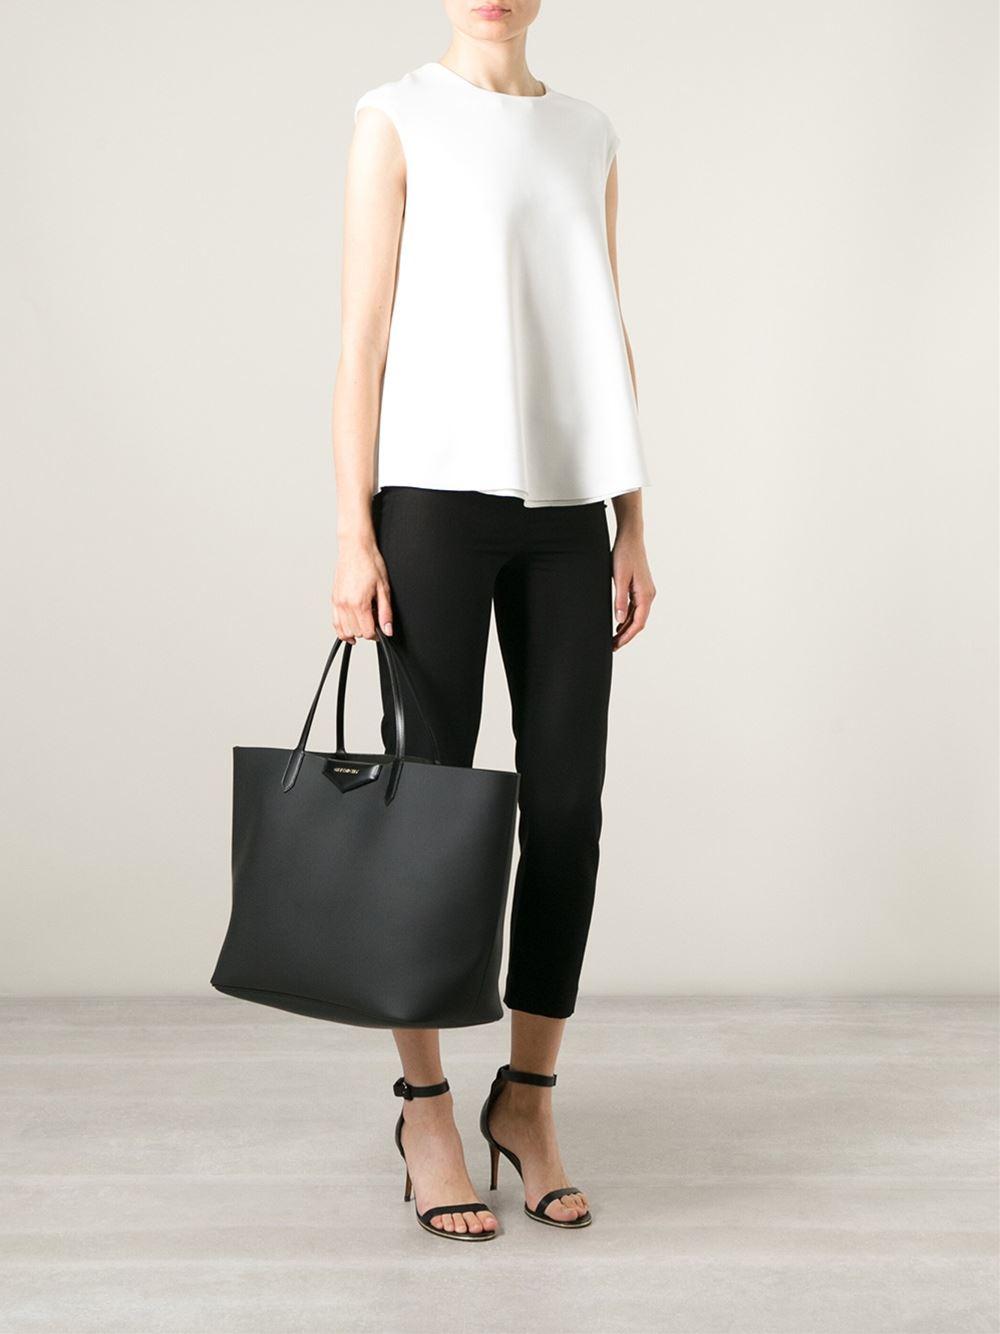 Lyst - Givenchy Large  Antigona  Shopper Tote in Black 9d5ca85451